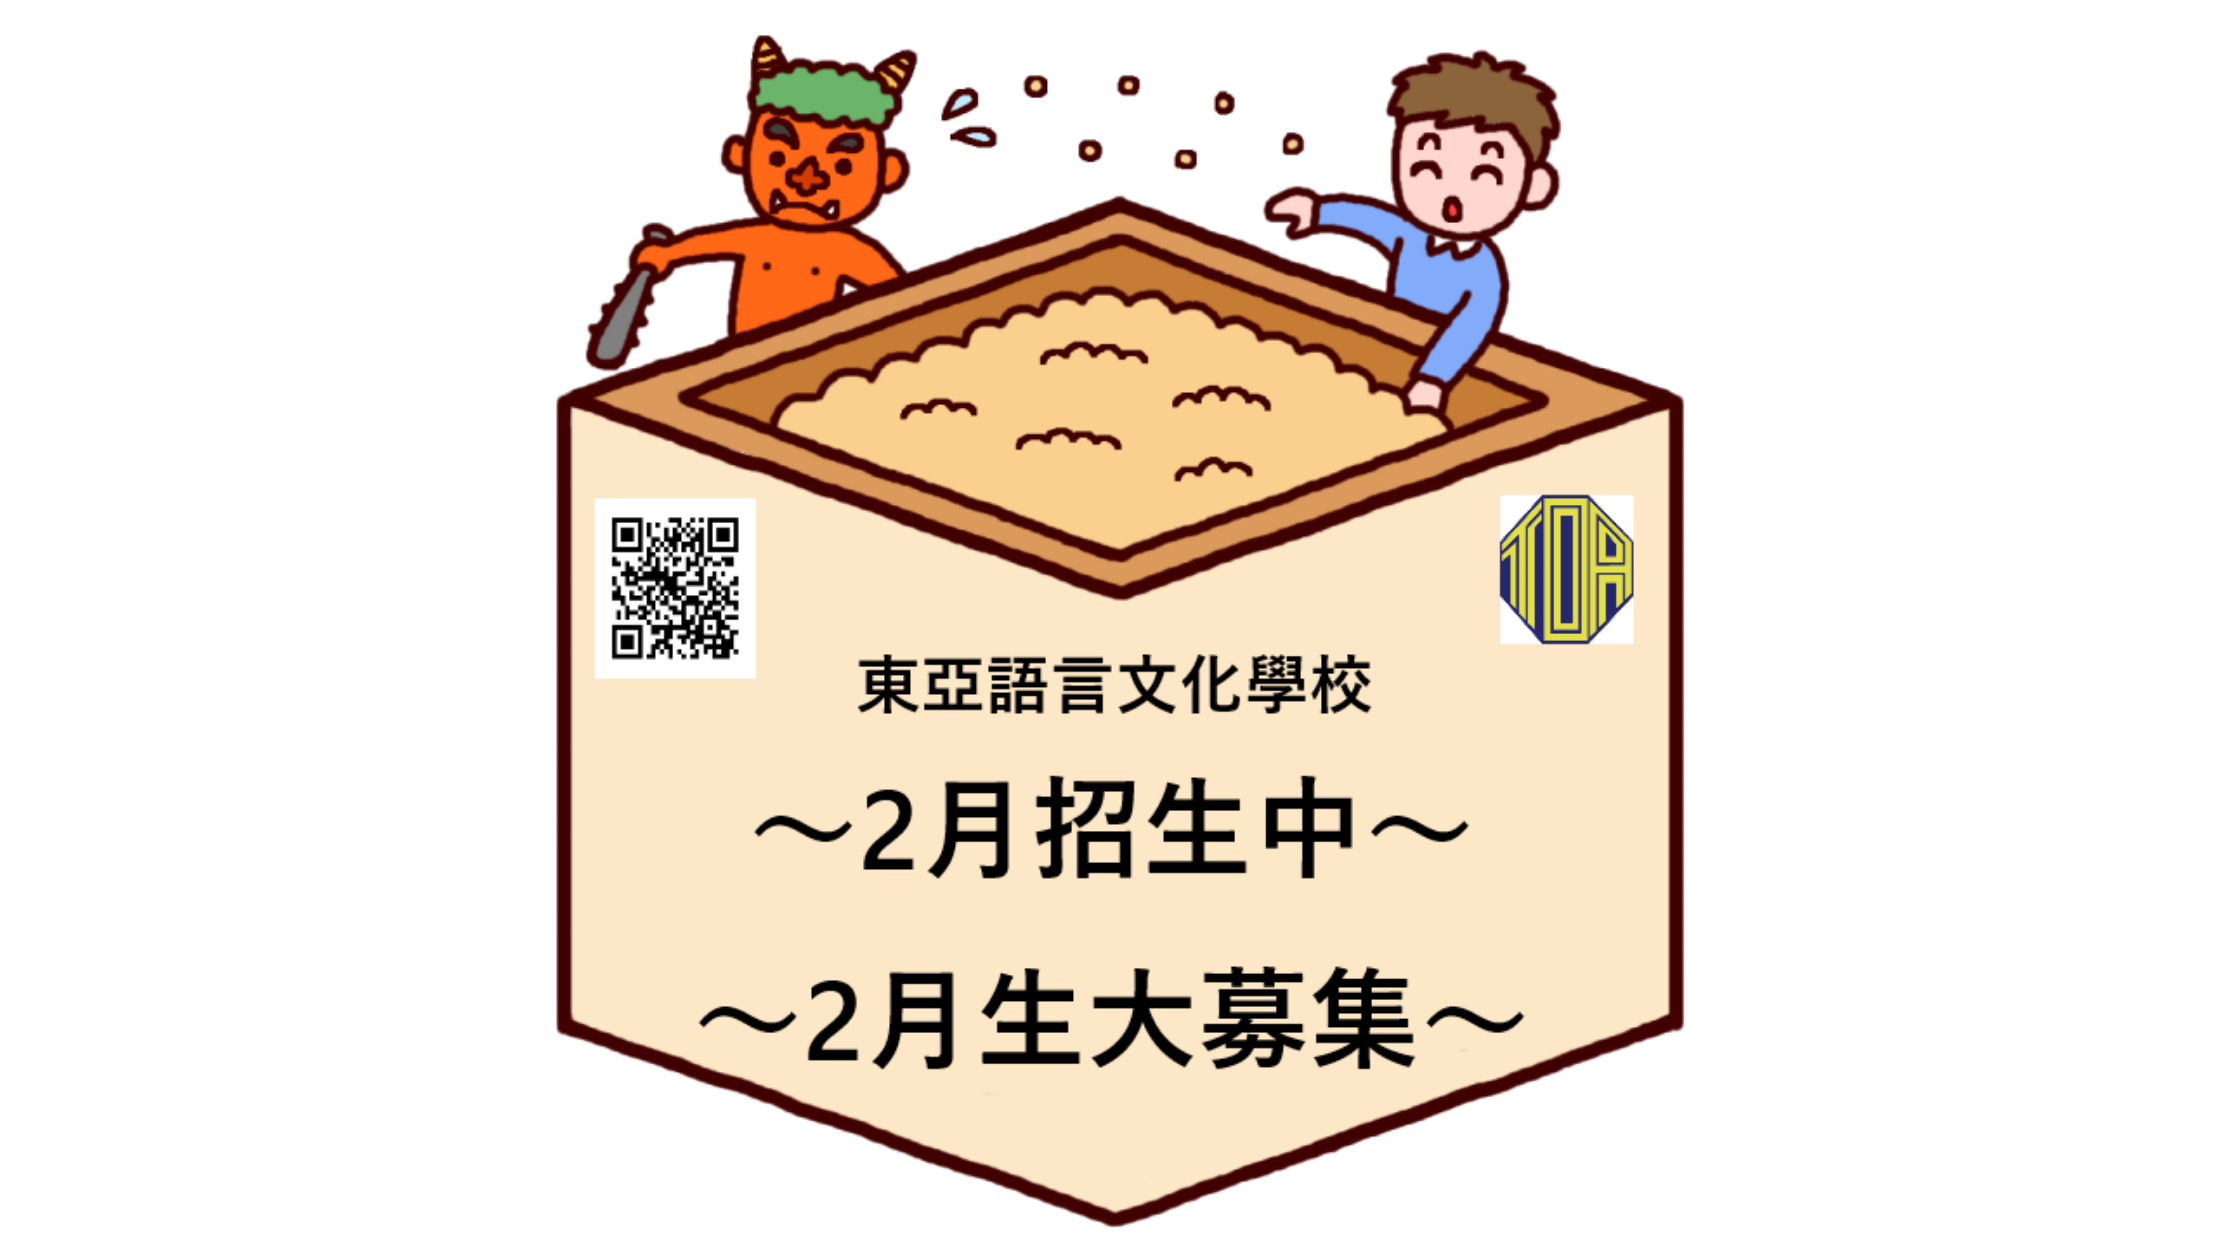 hongkong toa japanese school cantonese chinese summer courses 香港 東亞 日文 日本語 広東語 北京語